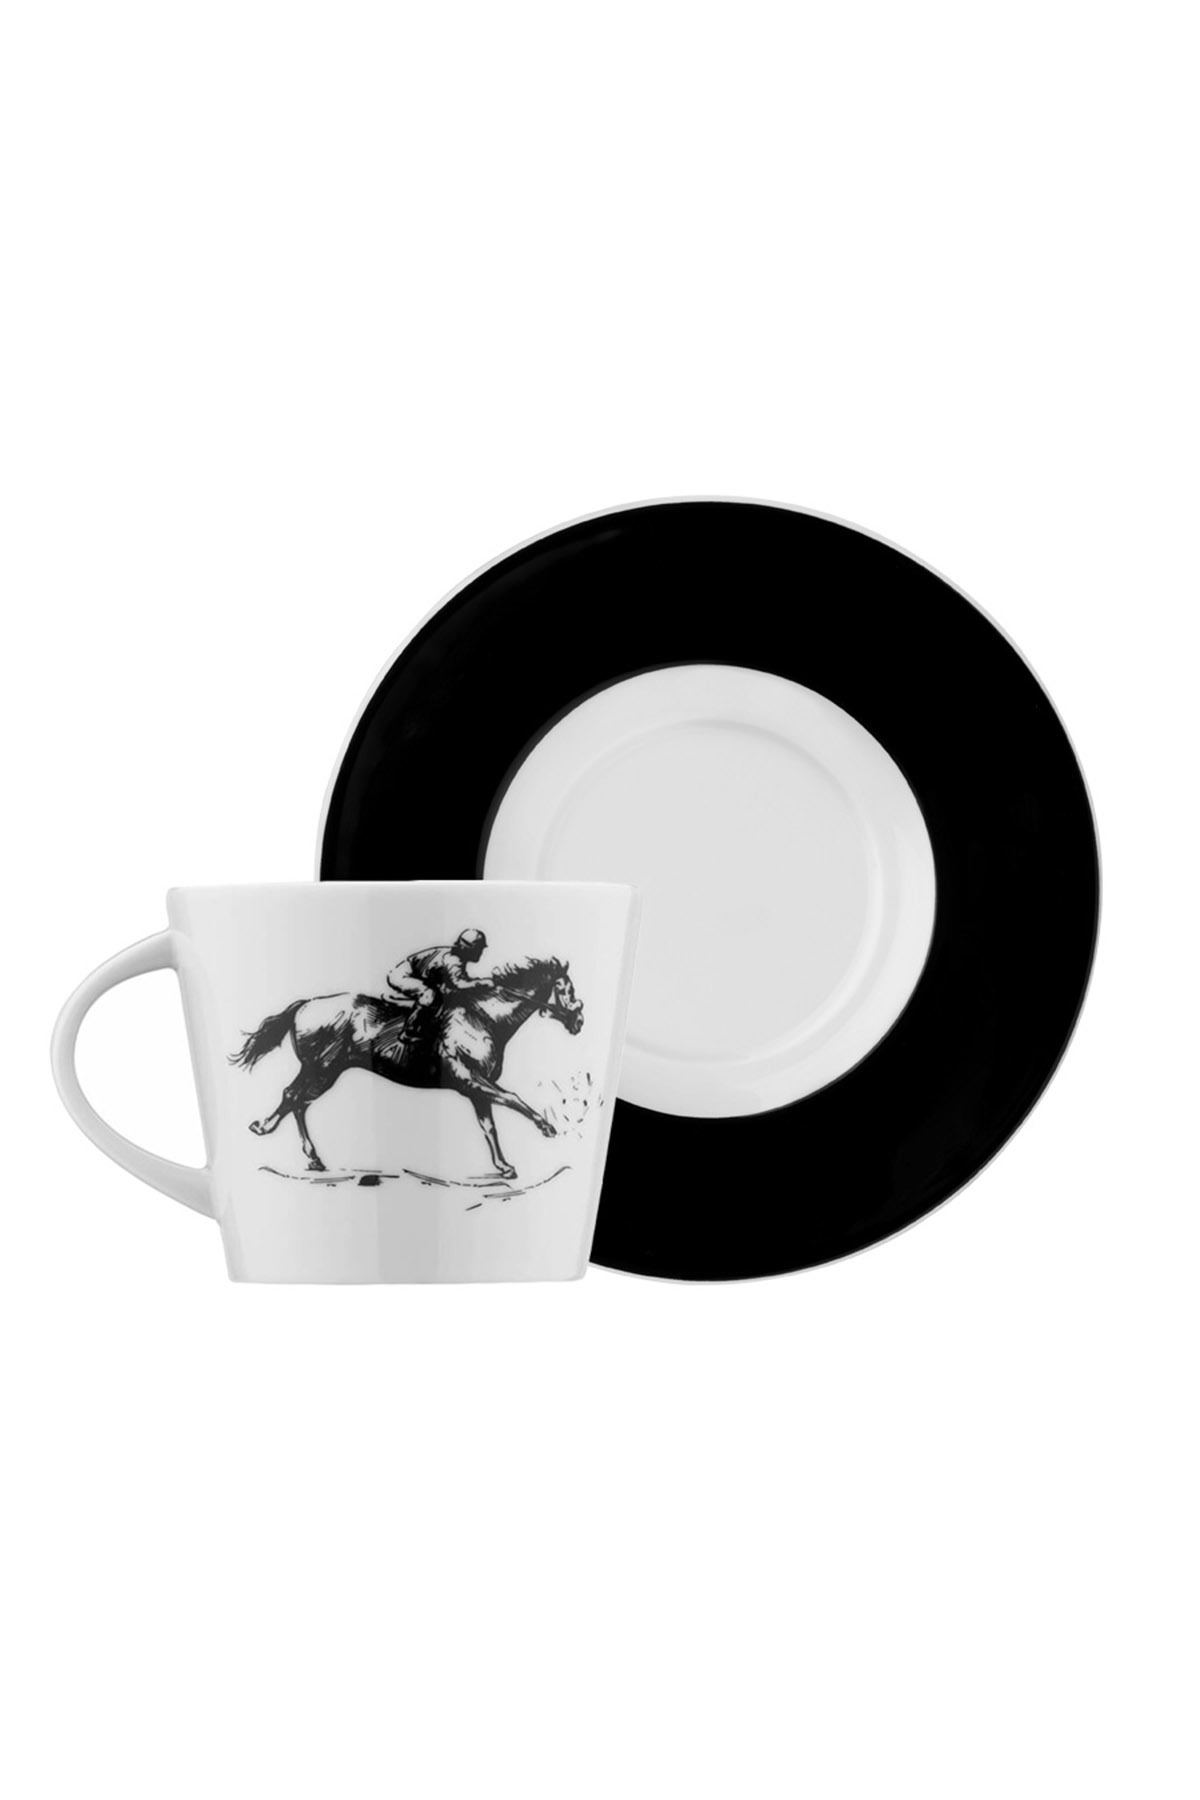 Kütahya Porselen - Kütahya Porselen Centilmen Serisi Kahve Fincan Takımı At